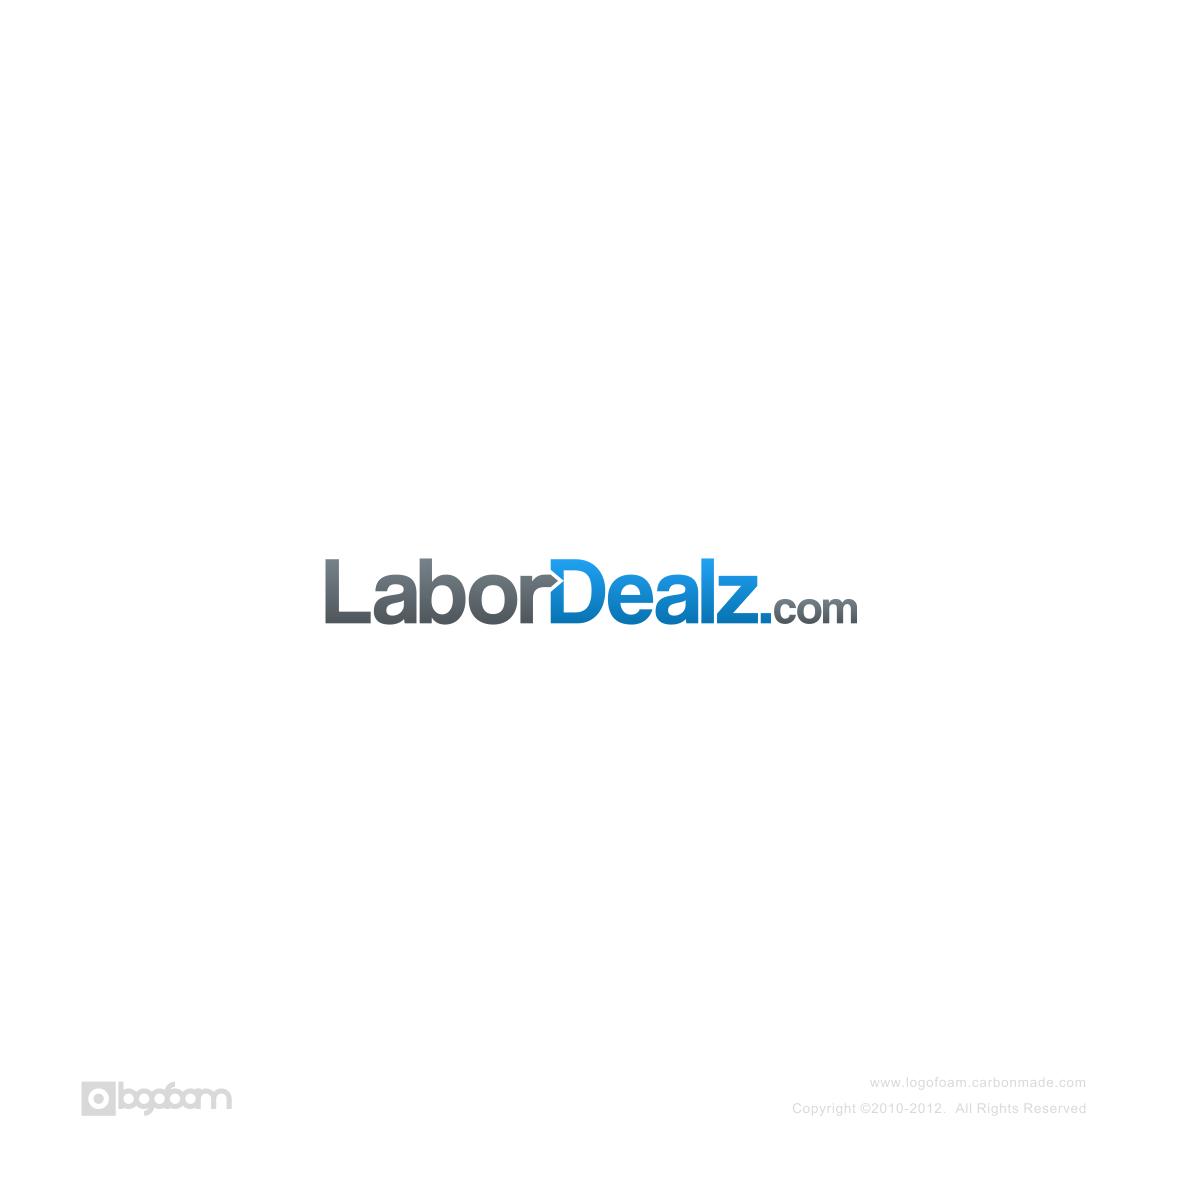 Help LABORDEALZ.COM with a new logo